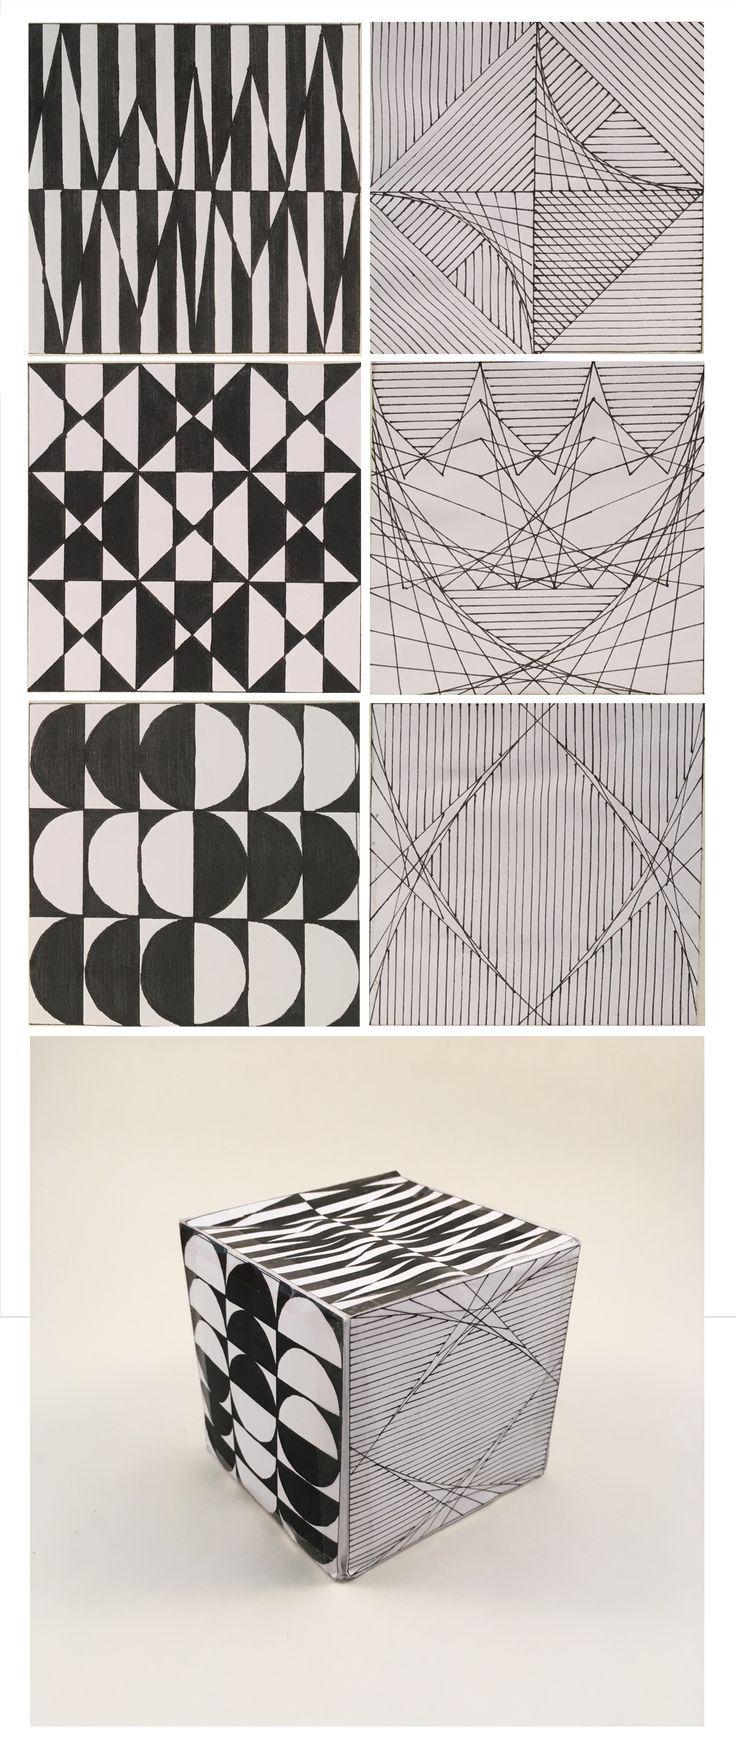 Manninger Zsuzsa, geometrikus minták / Manninger Zsuzsa, geometric pattern